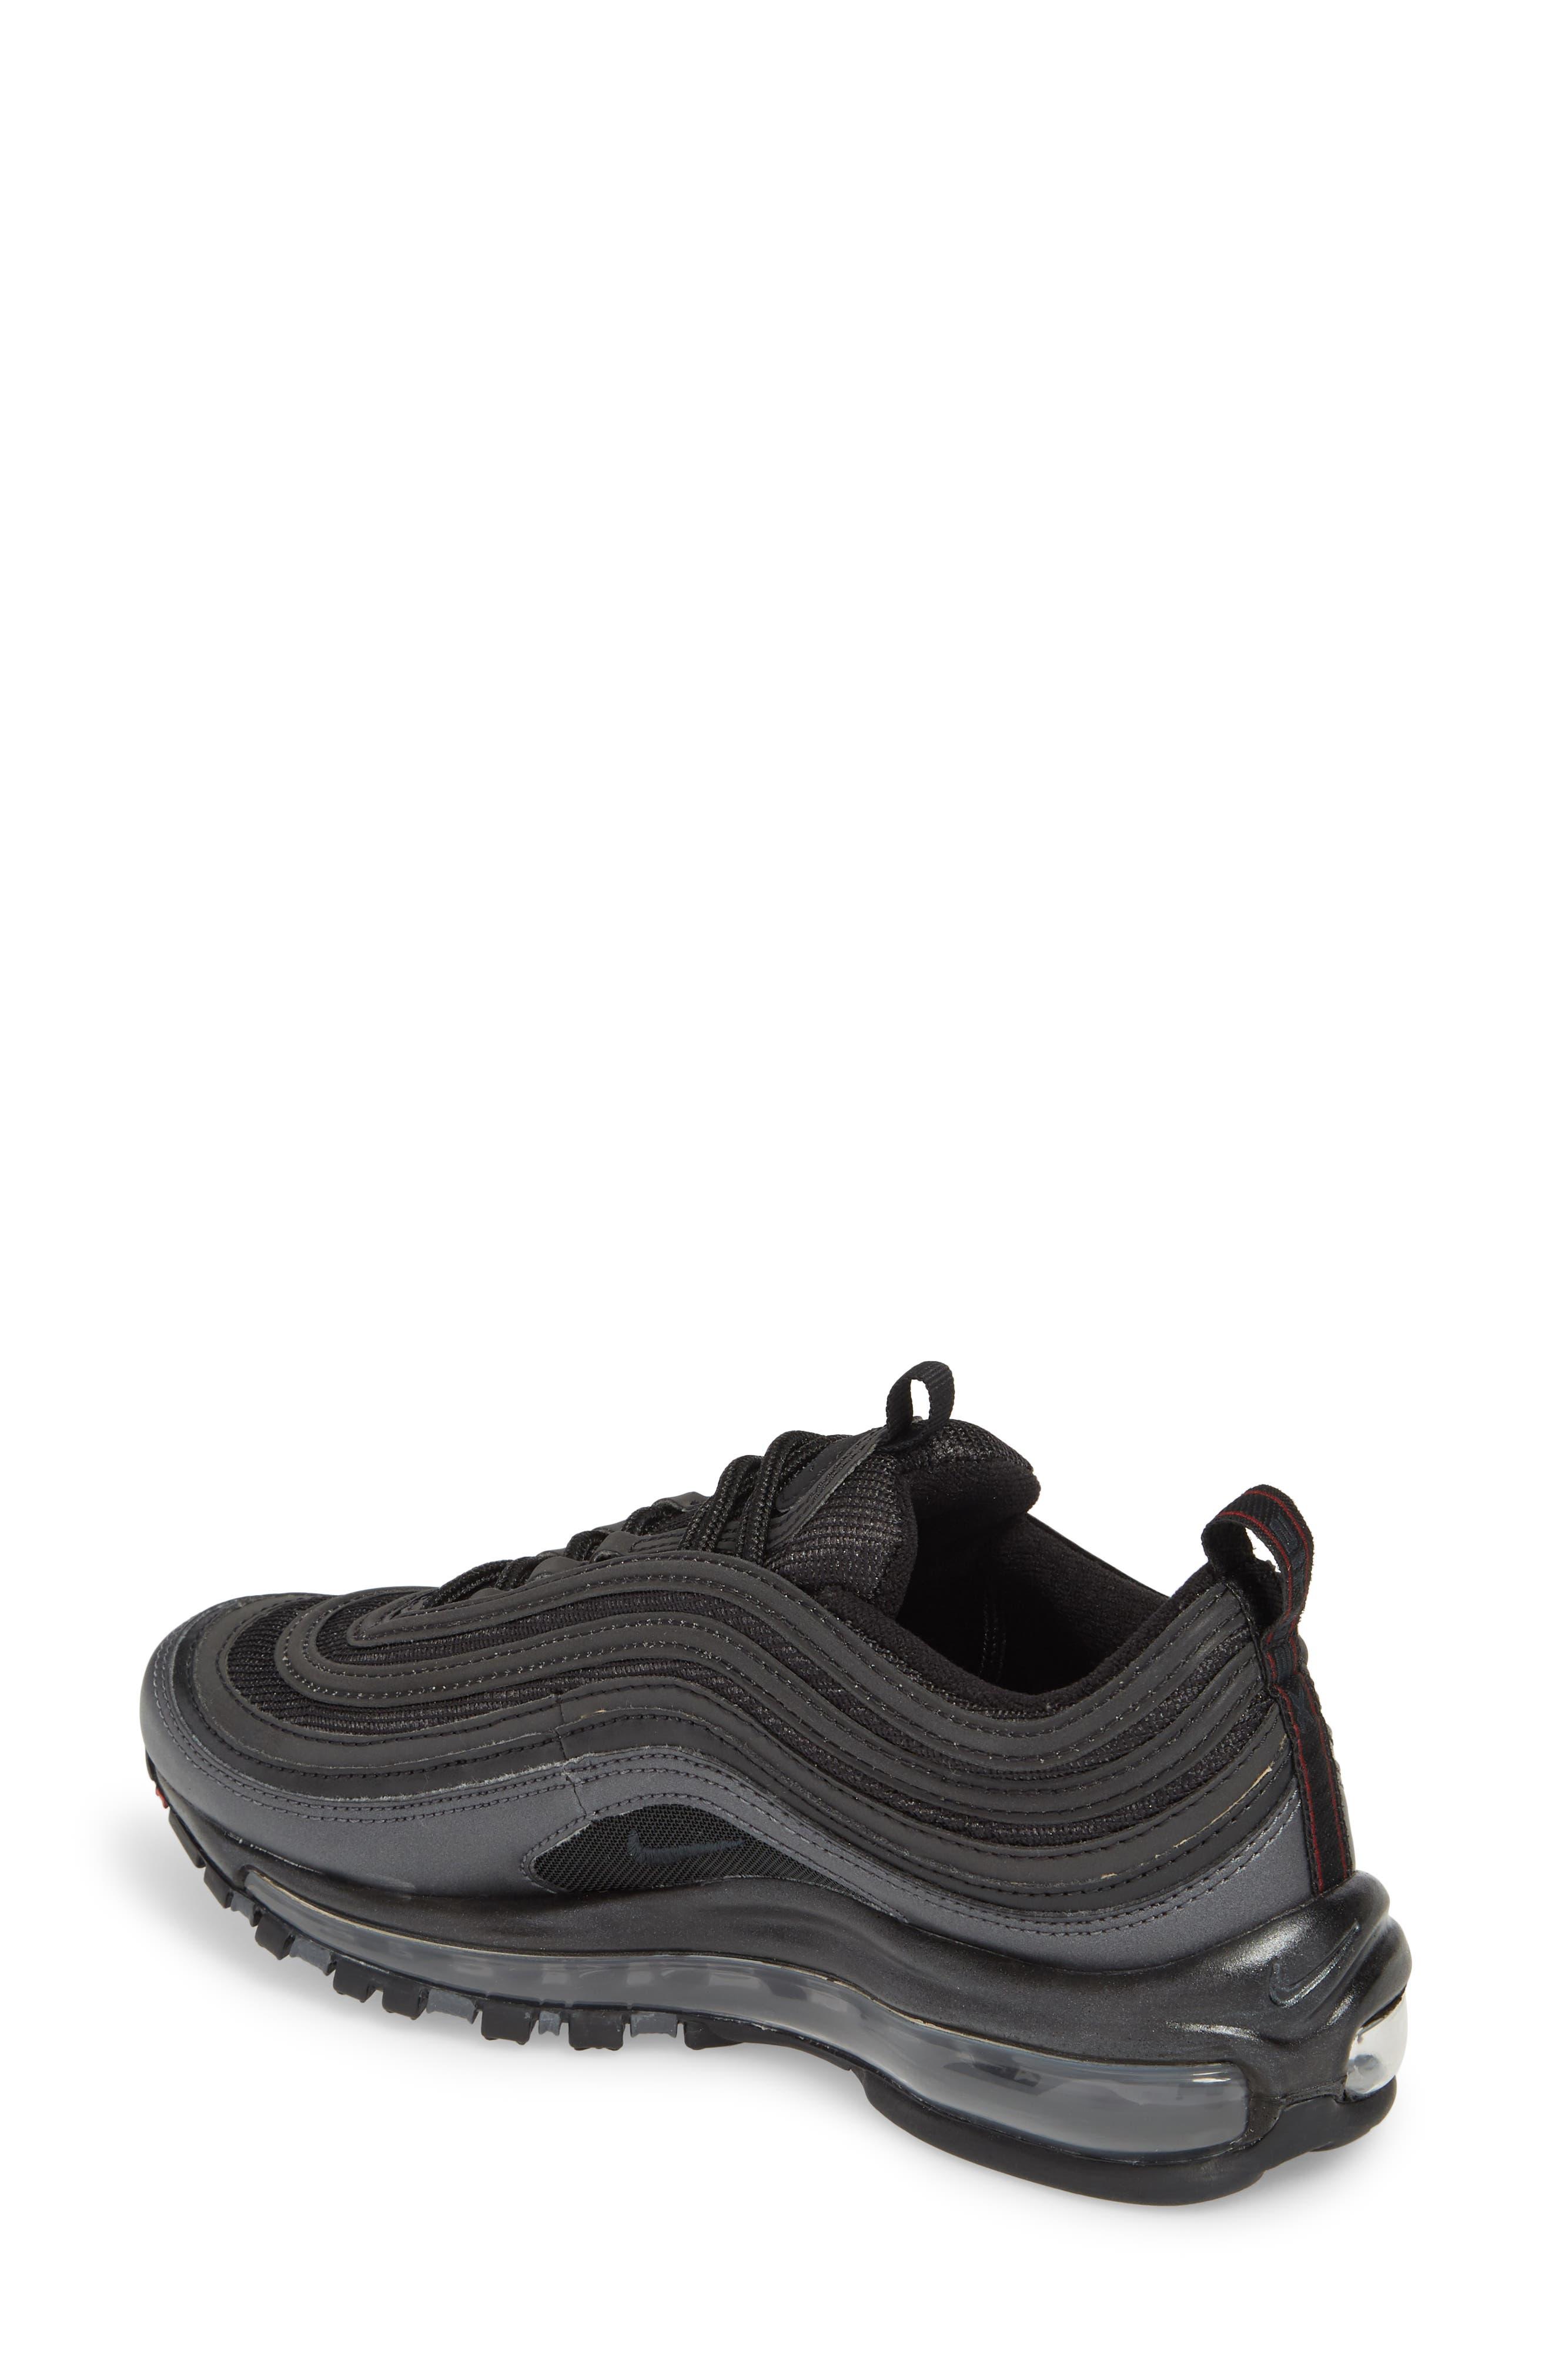 Air Max 97 Sneaker,                             Alternate thumbnail 2, color,                             Black/ Anthracite/ Hematite